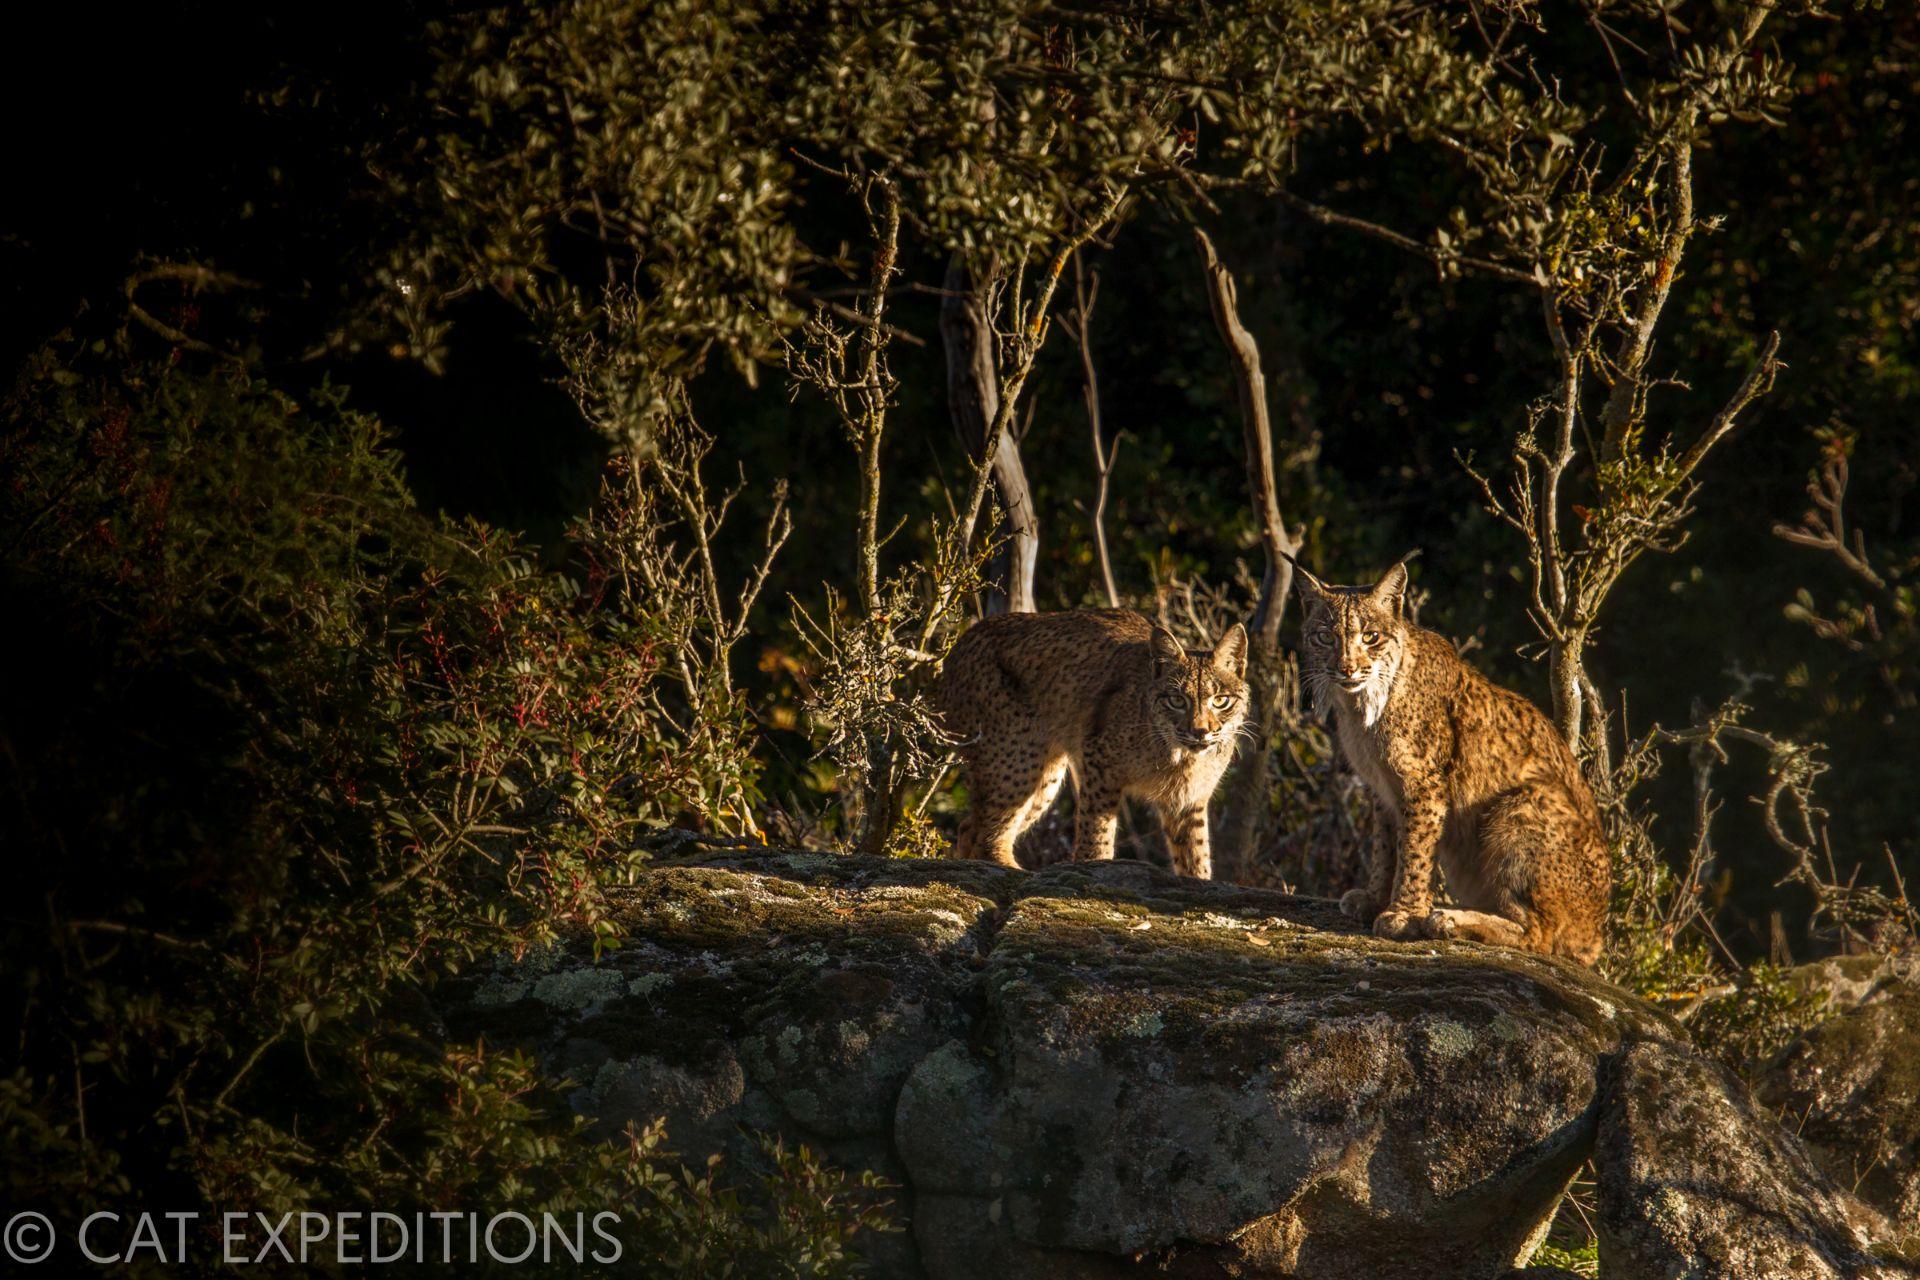 Iberian lynx mother and kitten